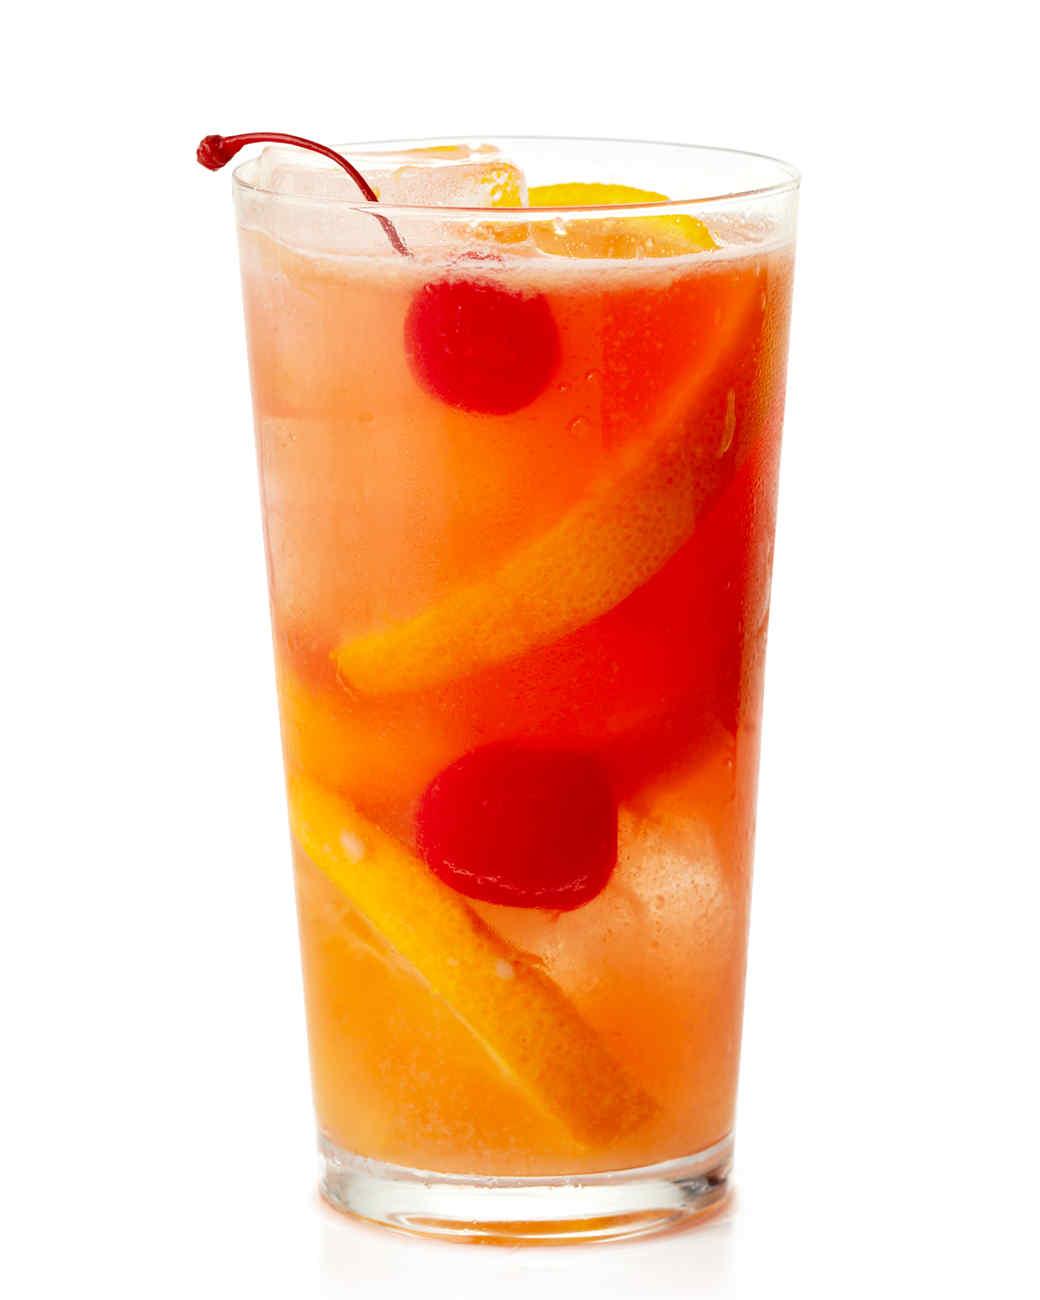 cherry-orange-drink-ed108679.jpg